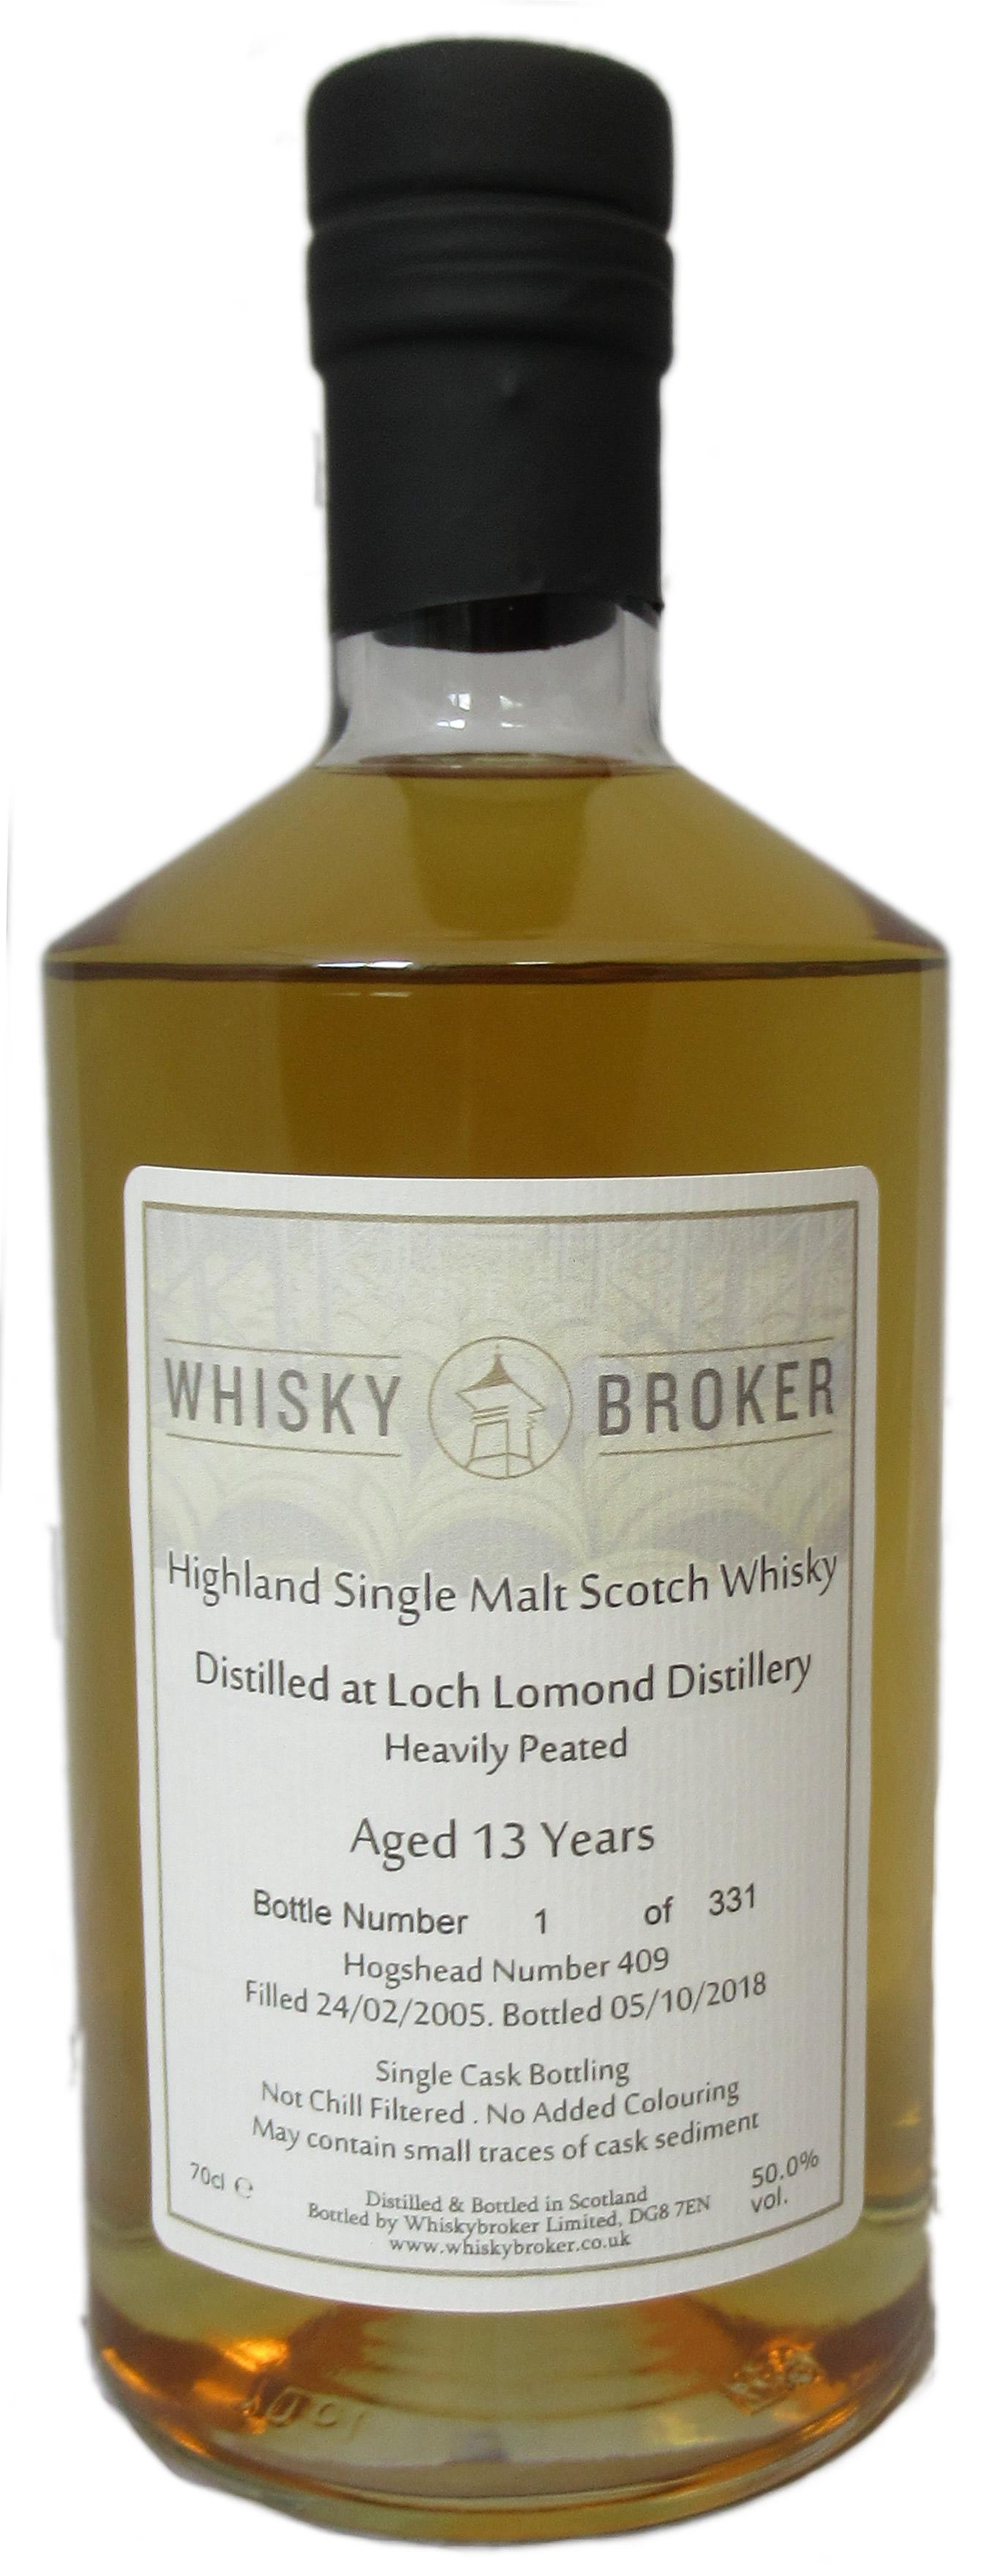 70cl, 13yo Distilled at Loch Lomond Distillery